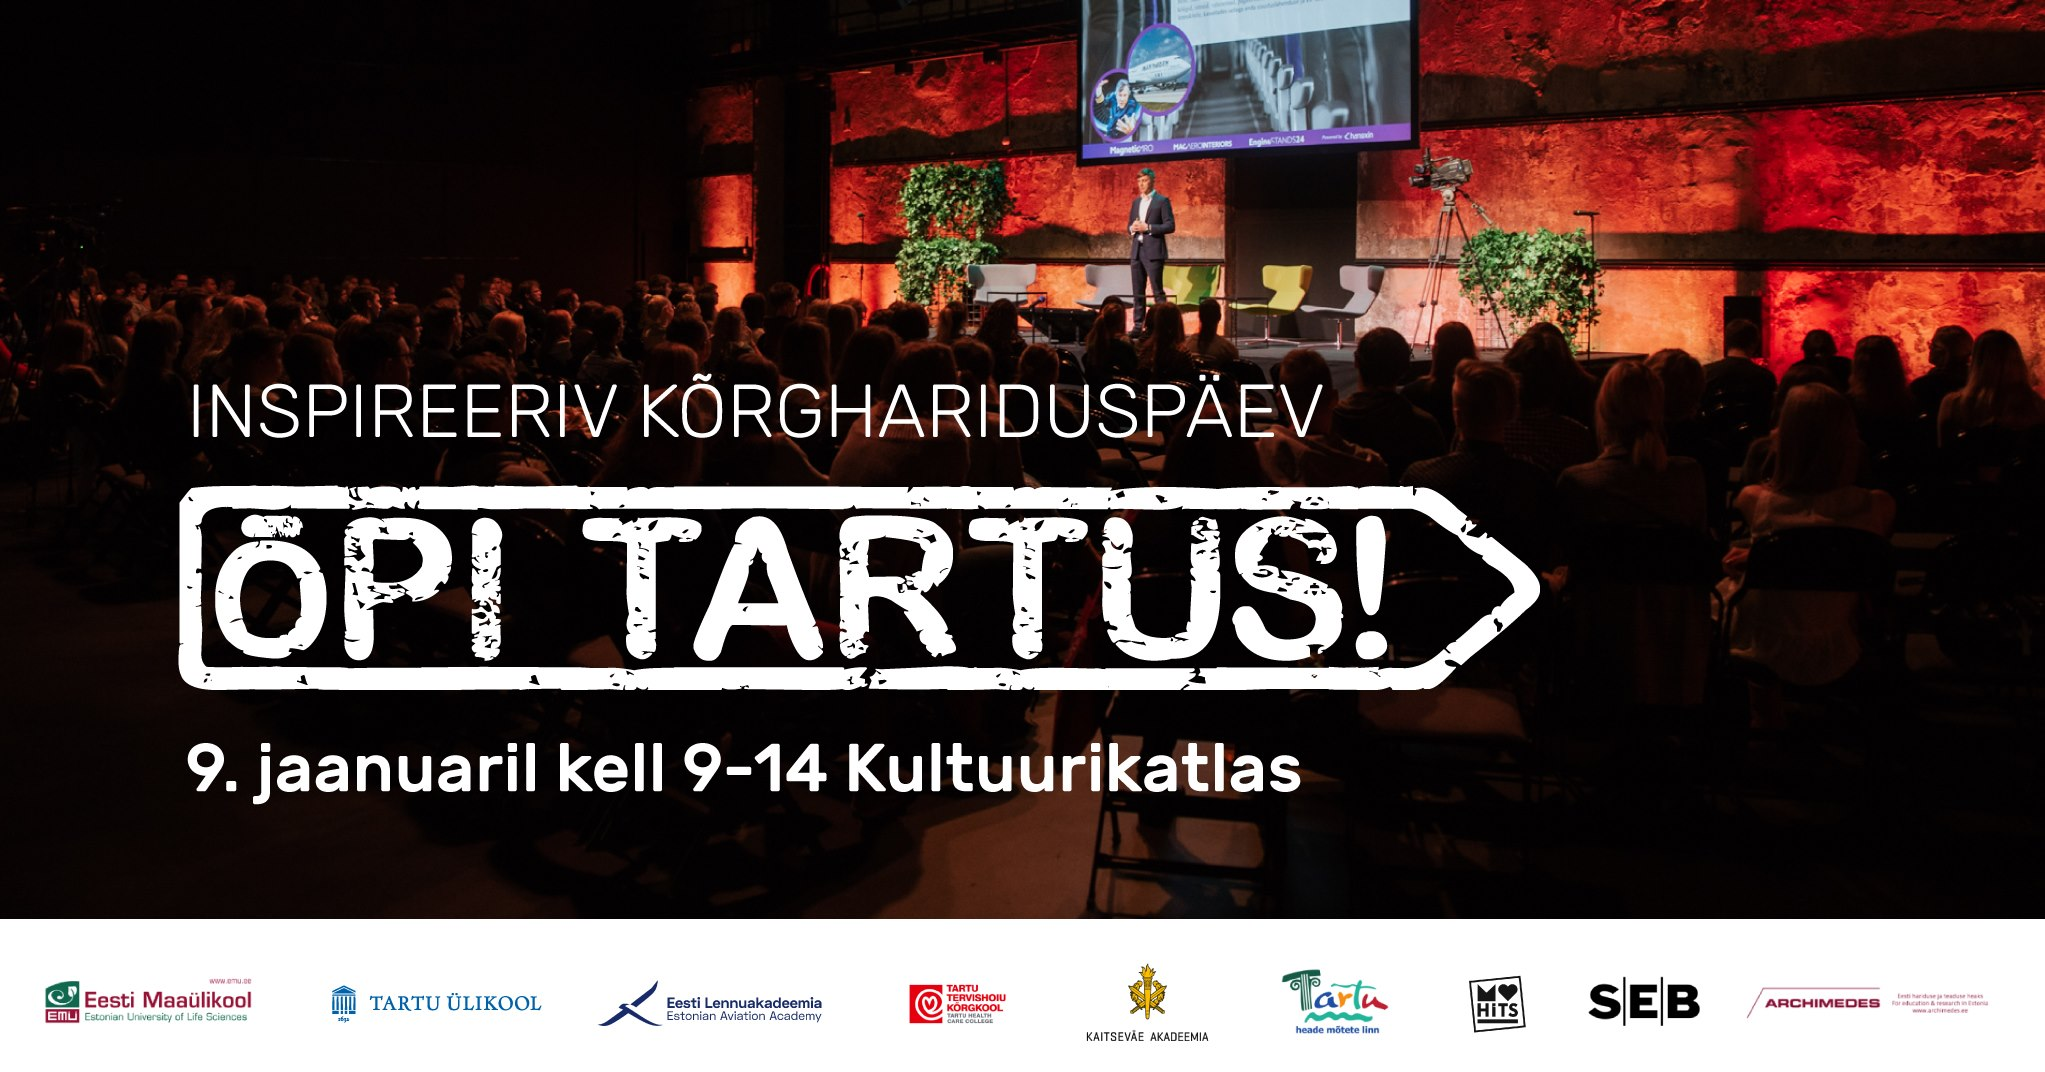 12623THE HIGHER EDUCATION DAY EVENT, STUDY IN TARTU (ÕPI TARTUS)!